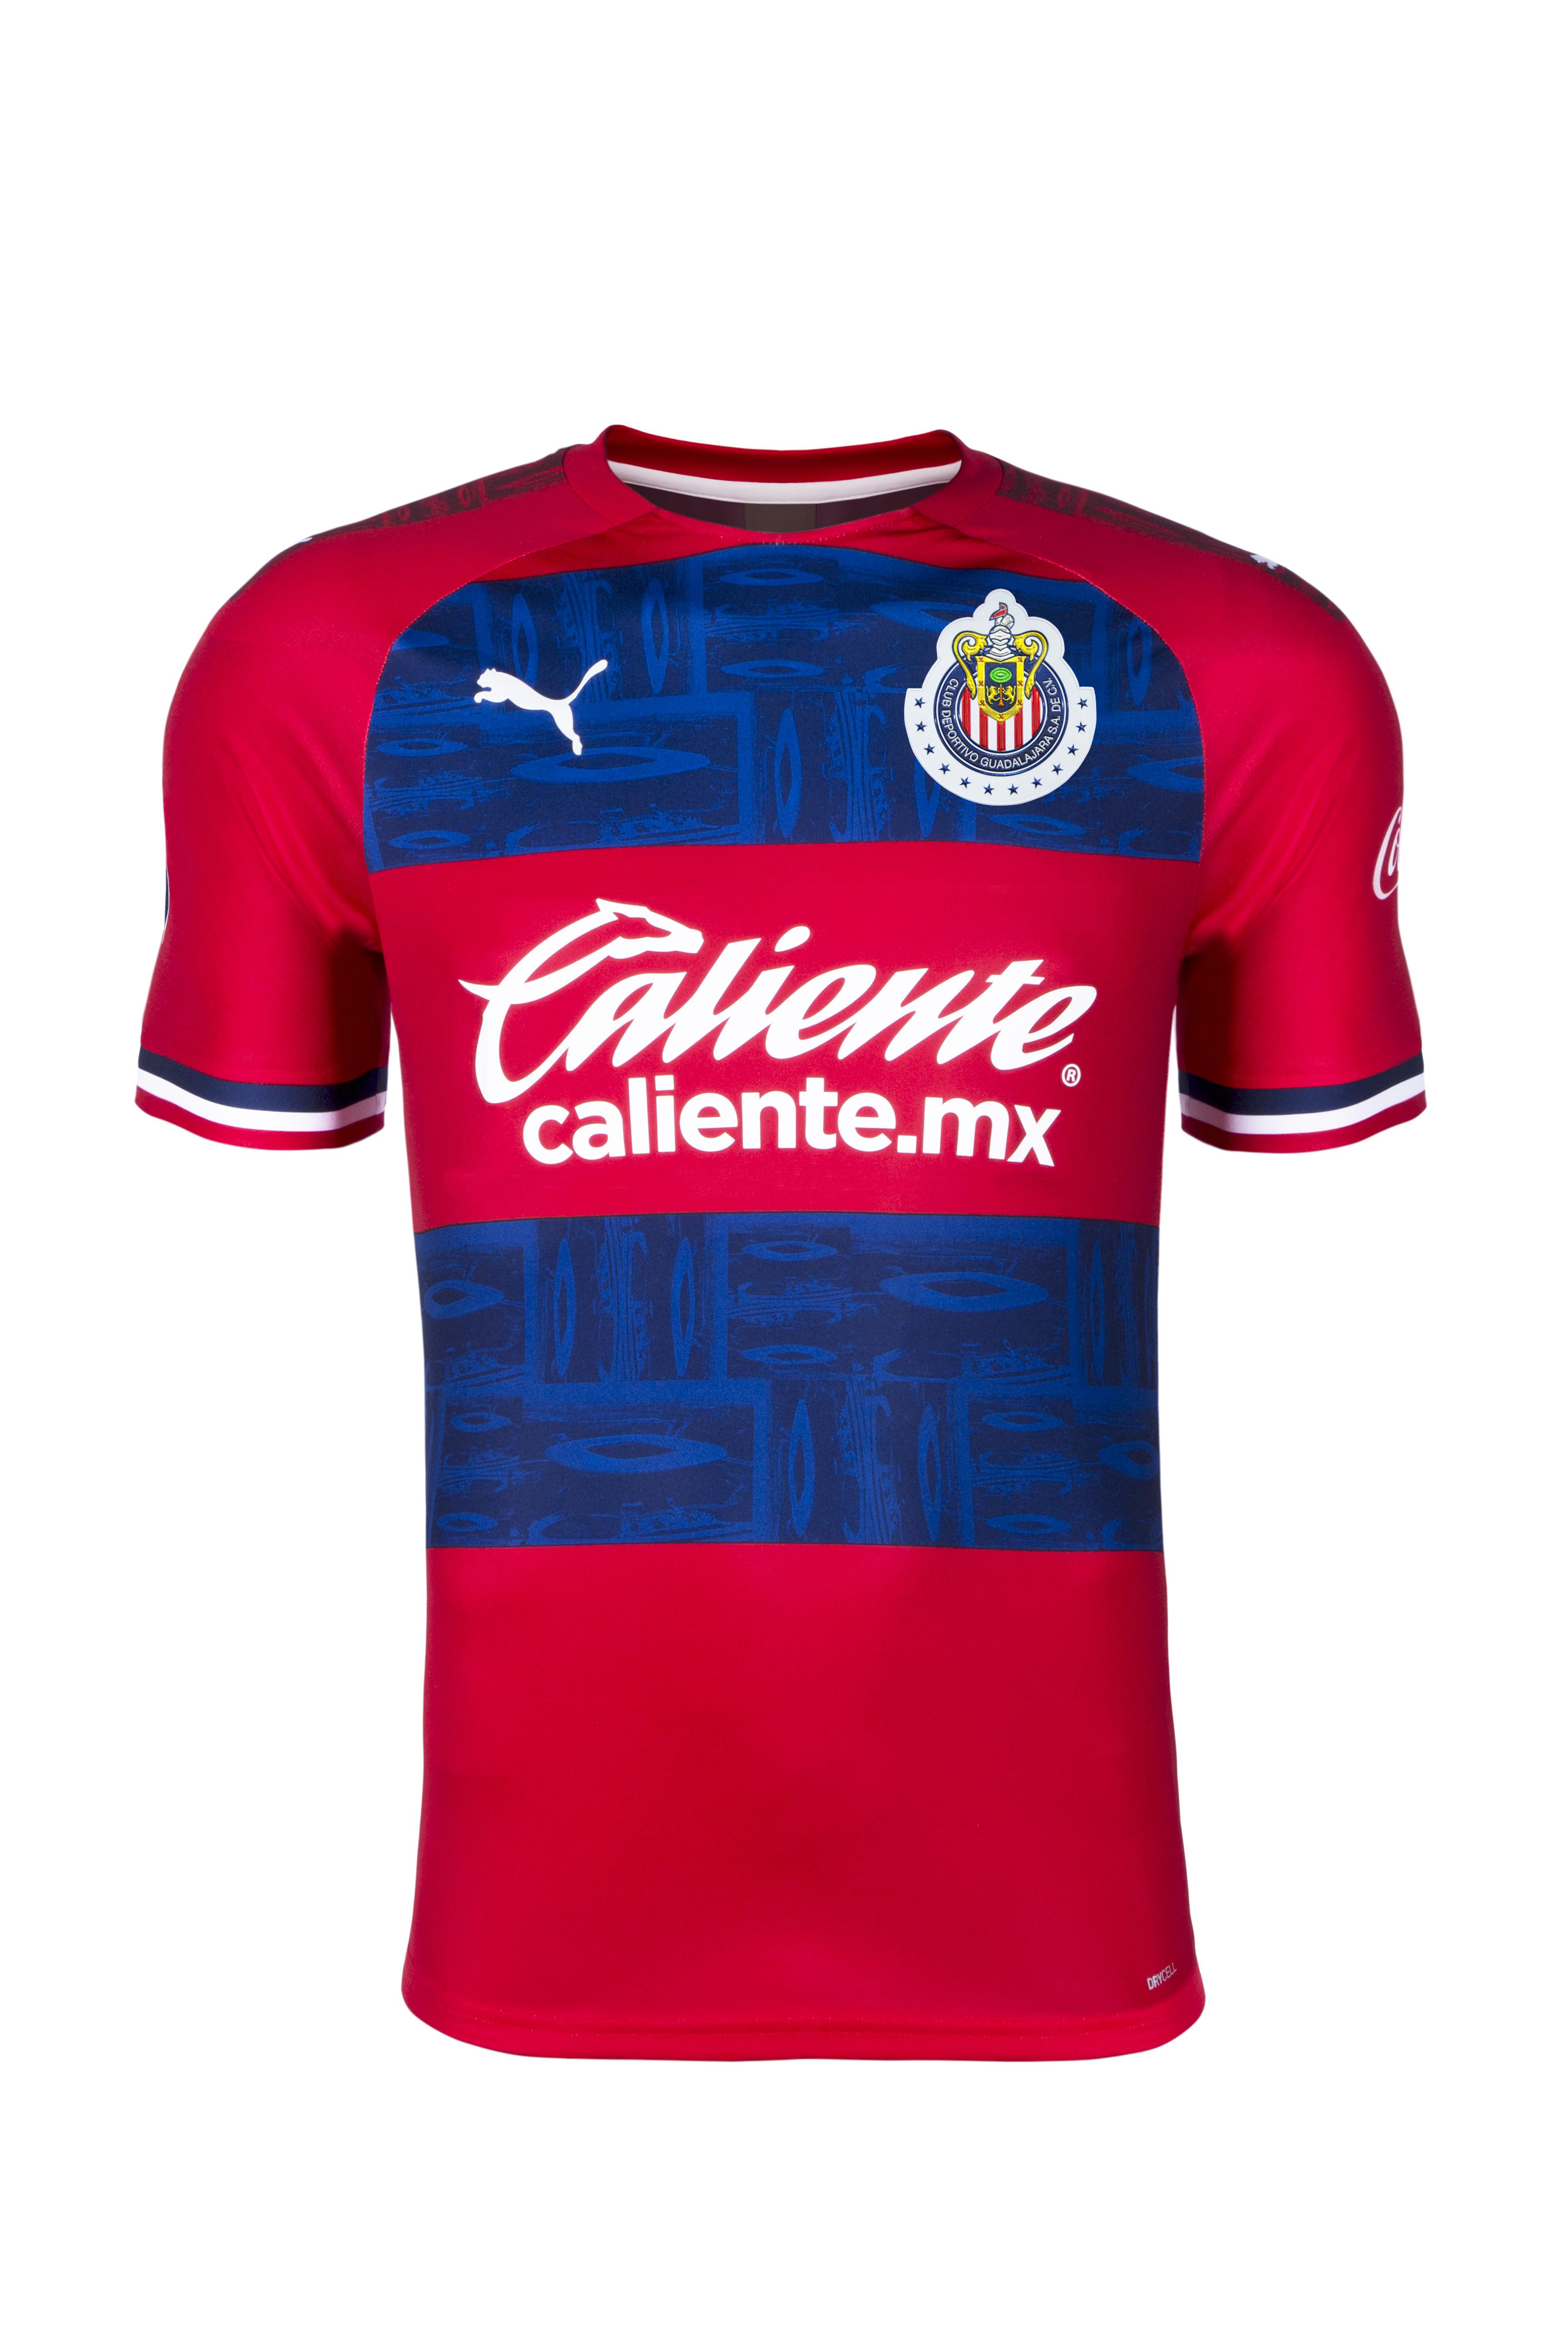 Chivas visitante playera Apertura 2019